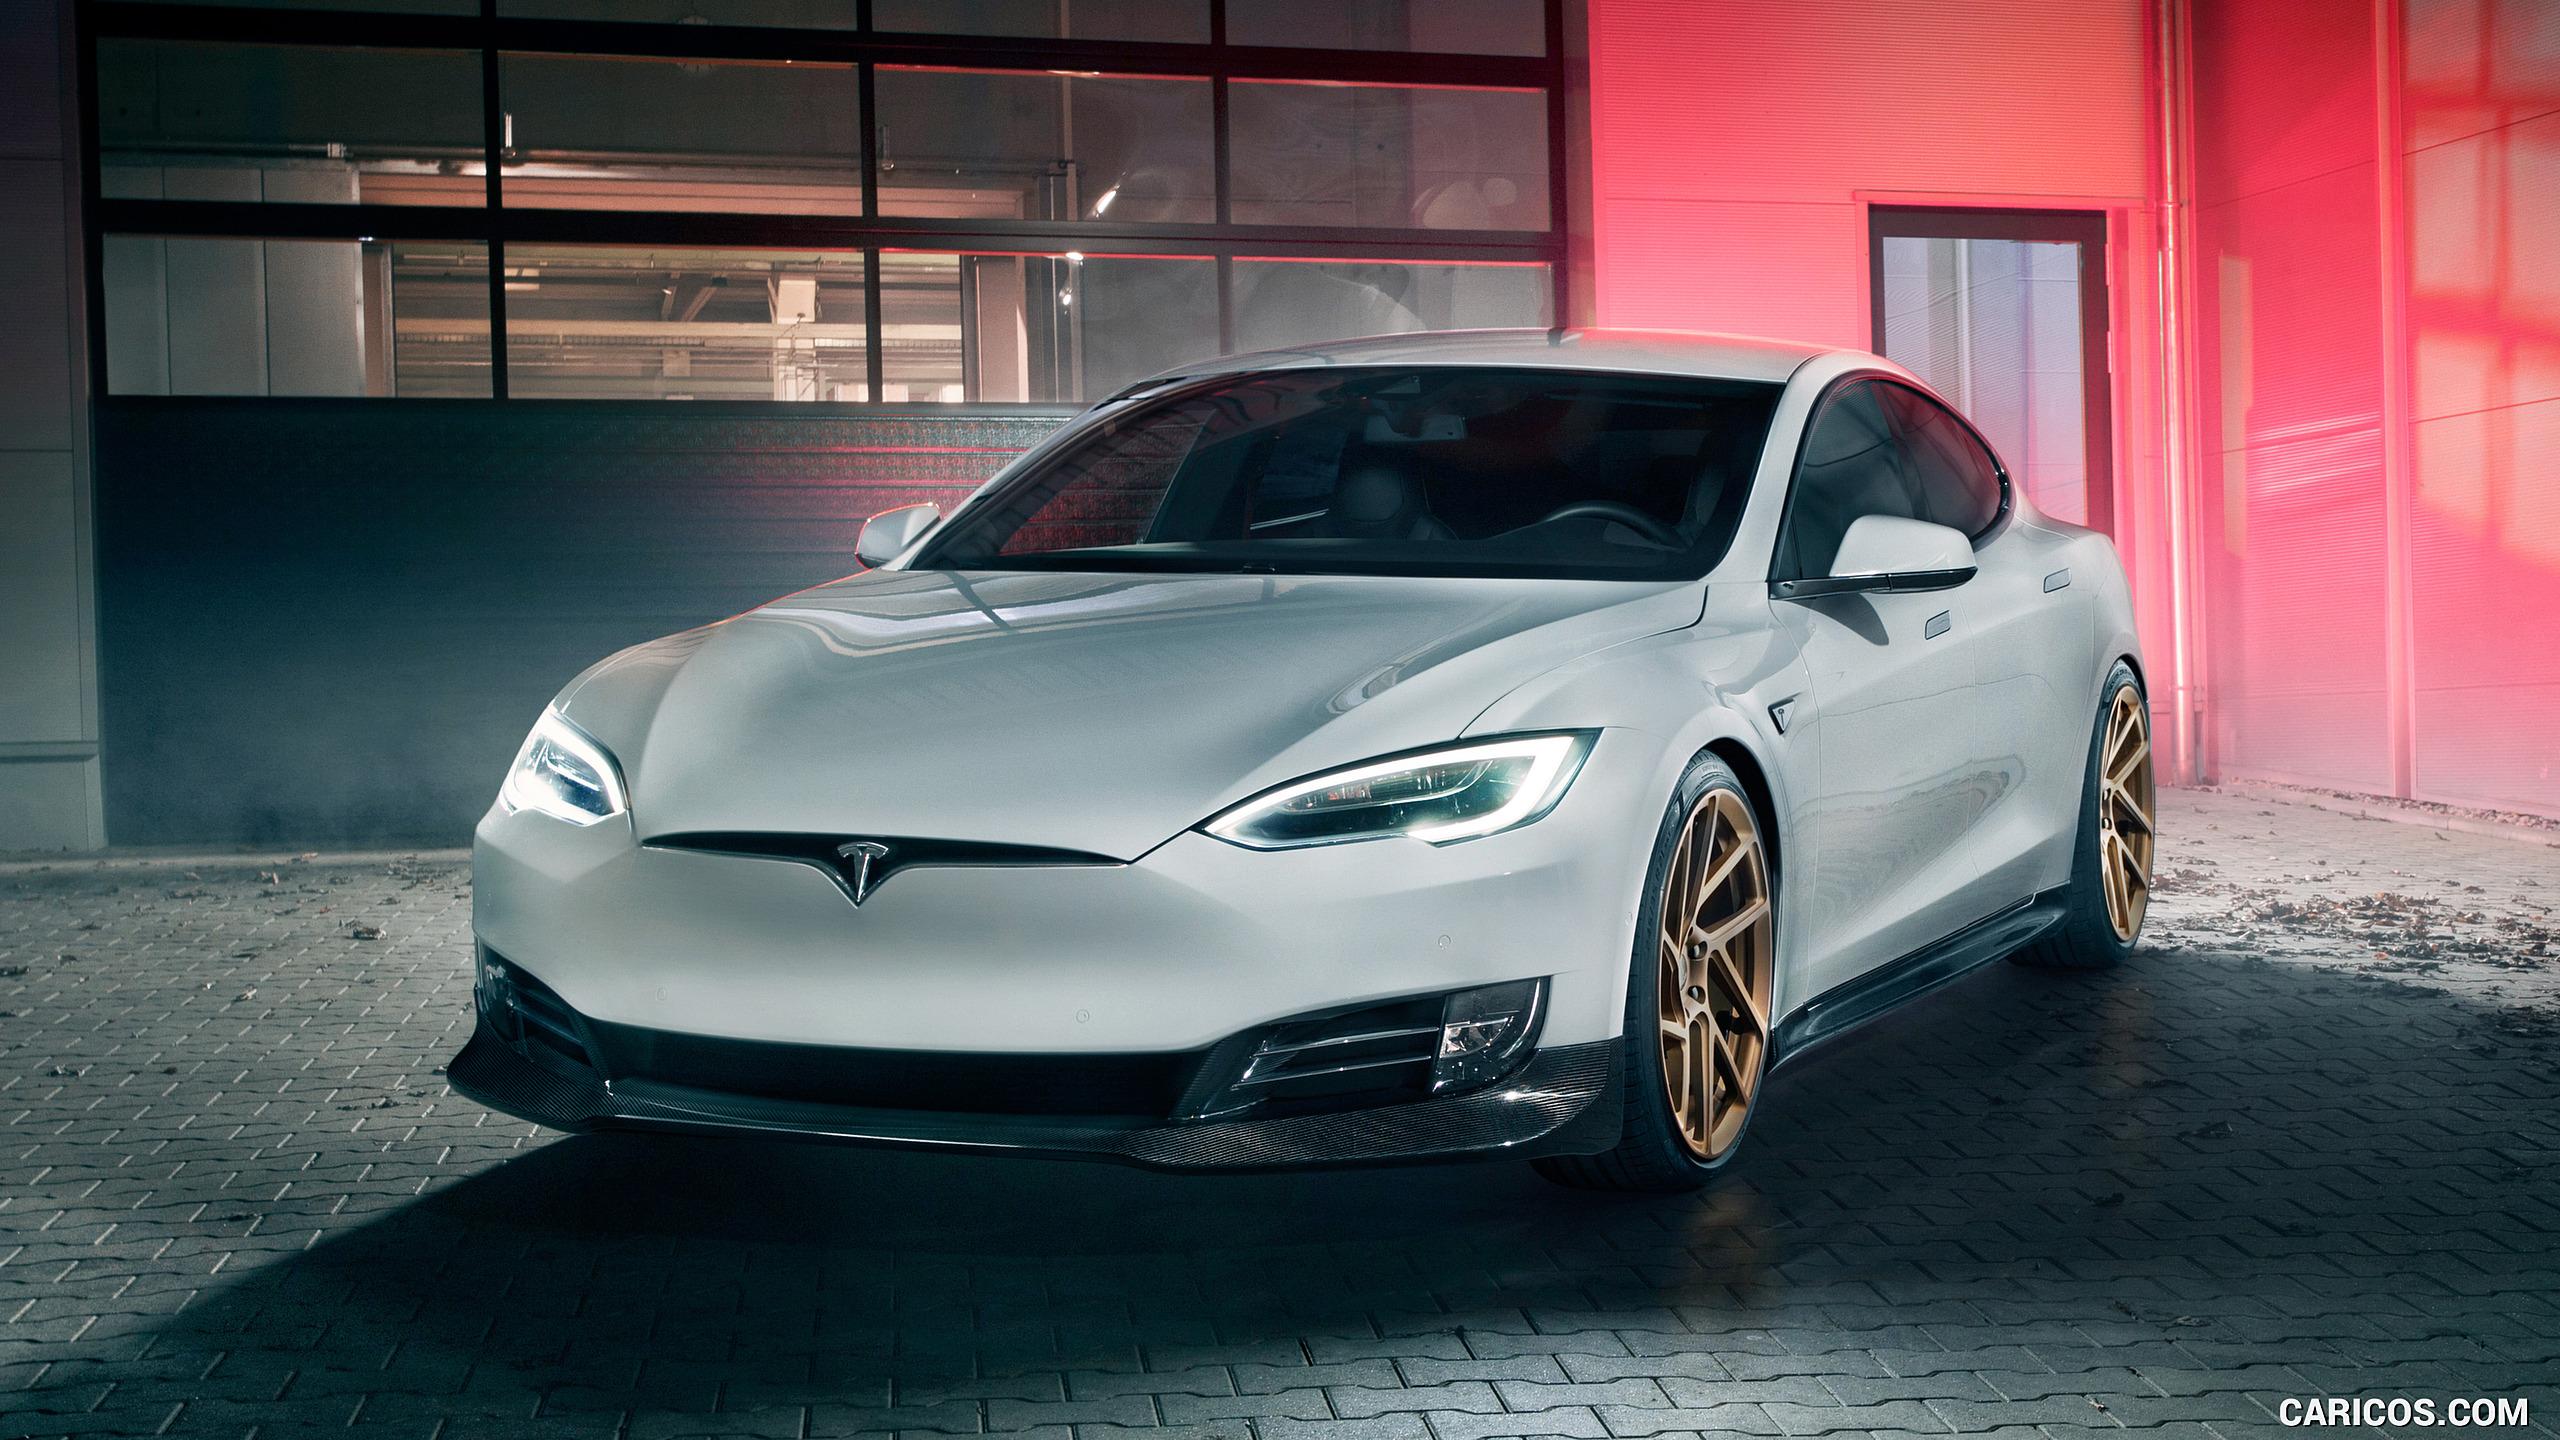 23] 2018 Tesla Model S Wallpapers on WallpaperSafari 2560x1440